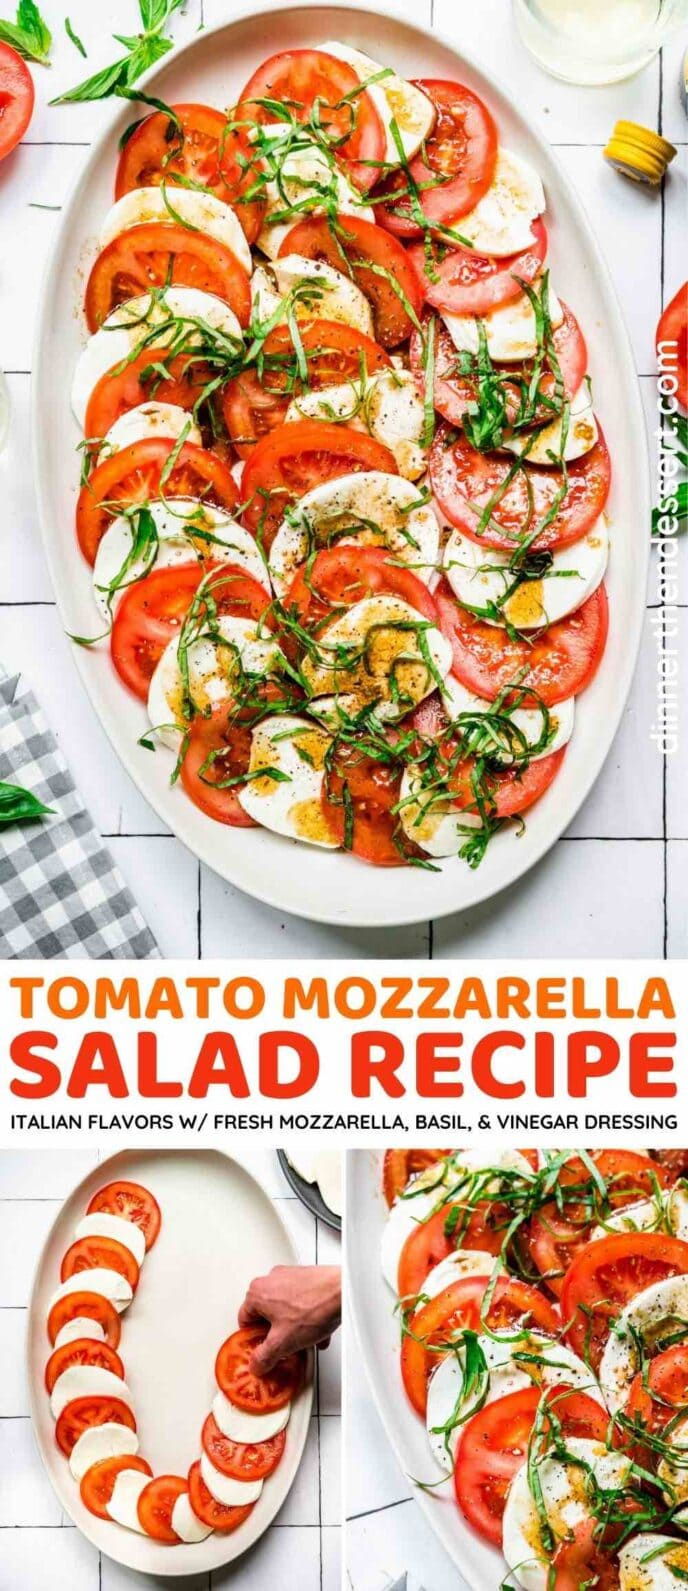 Tomato Mozzarella Salad collage